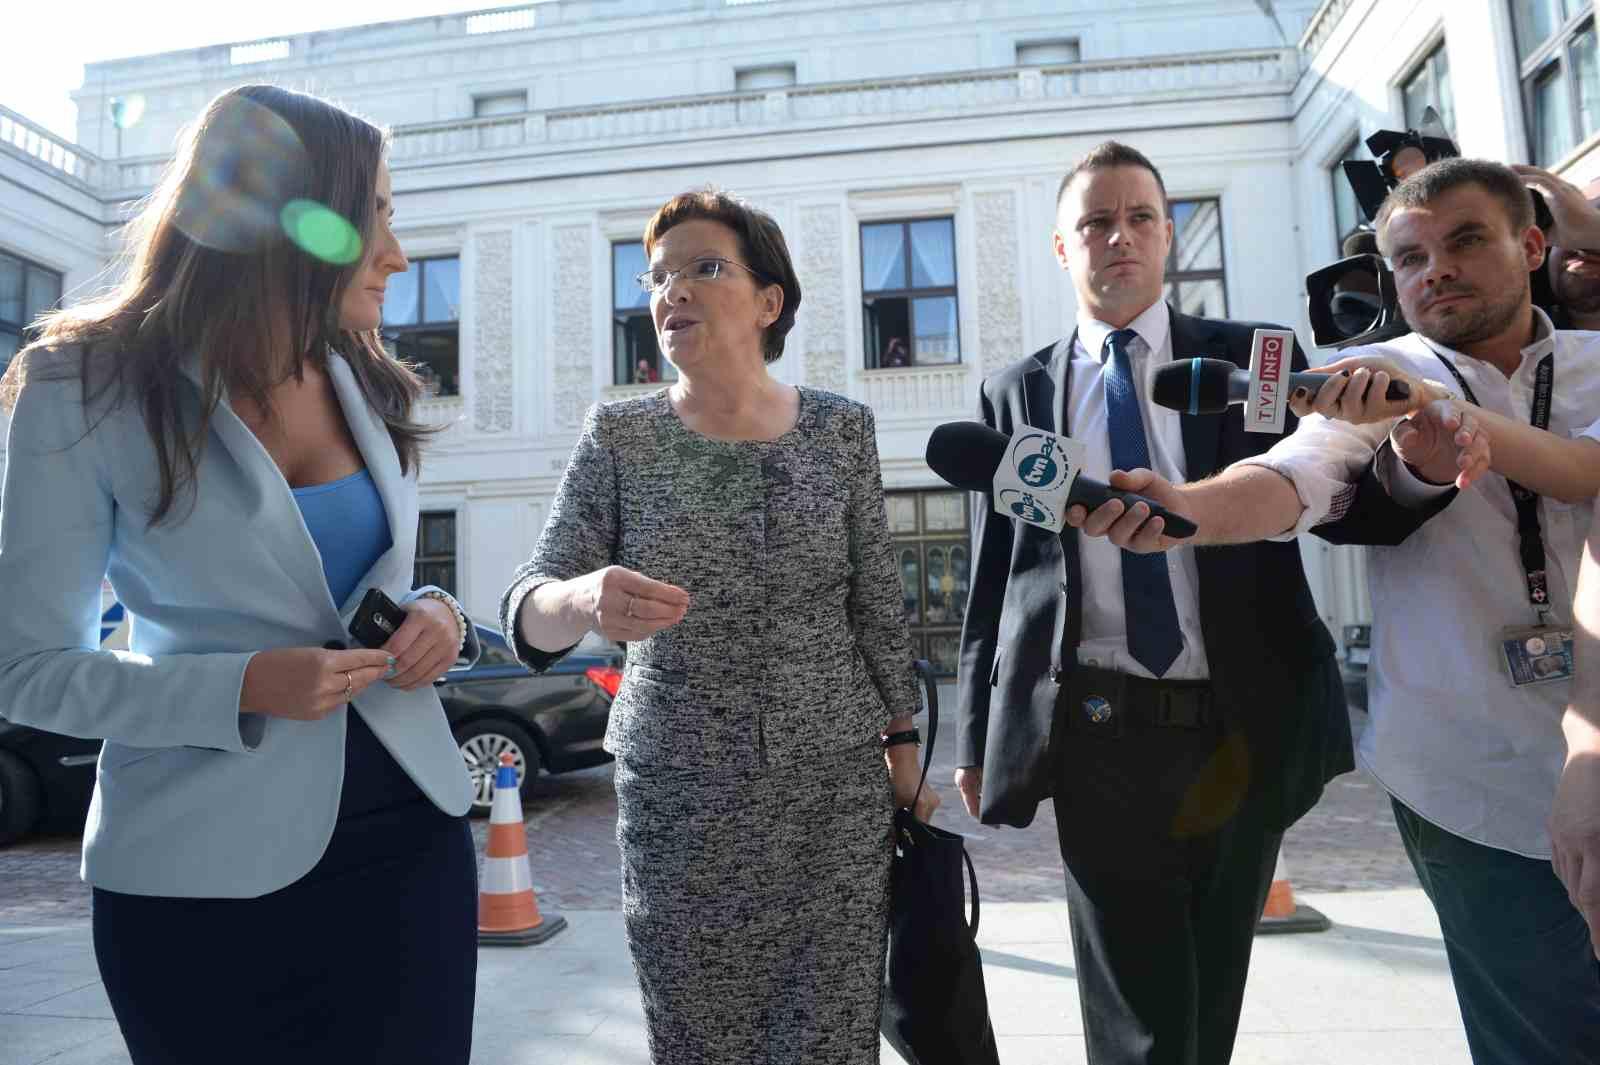 Ewa Kopacz leaves the Belvedere Palace on Friday. Photo: PAP/Tomasz Gzell